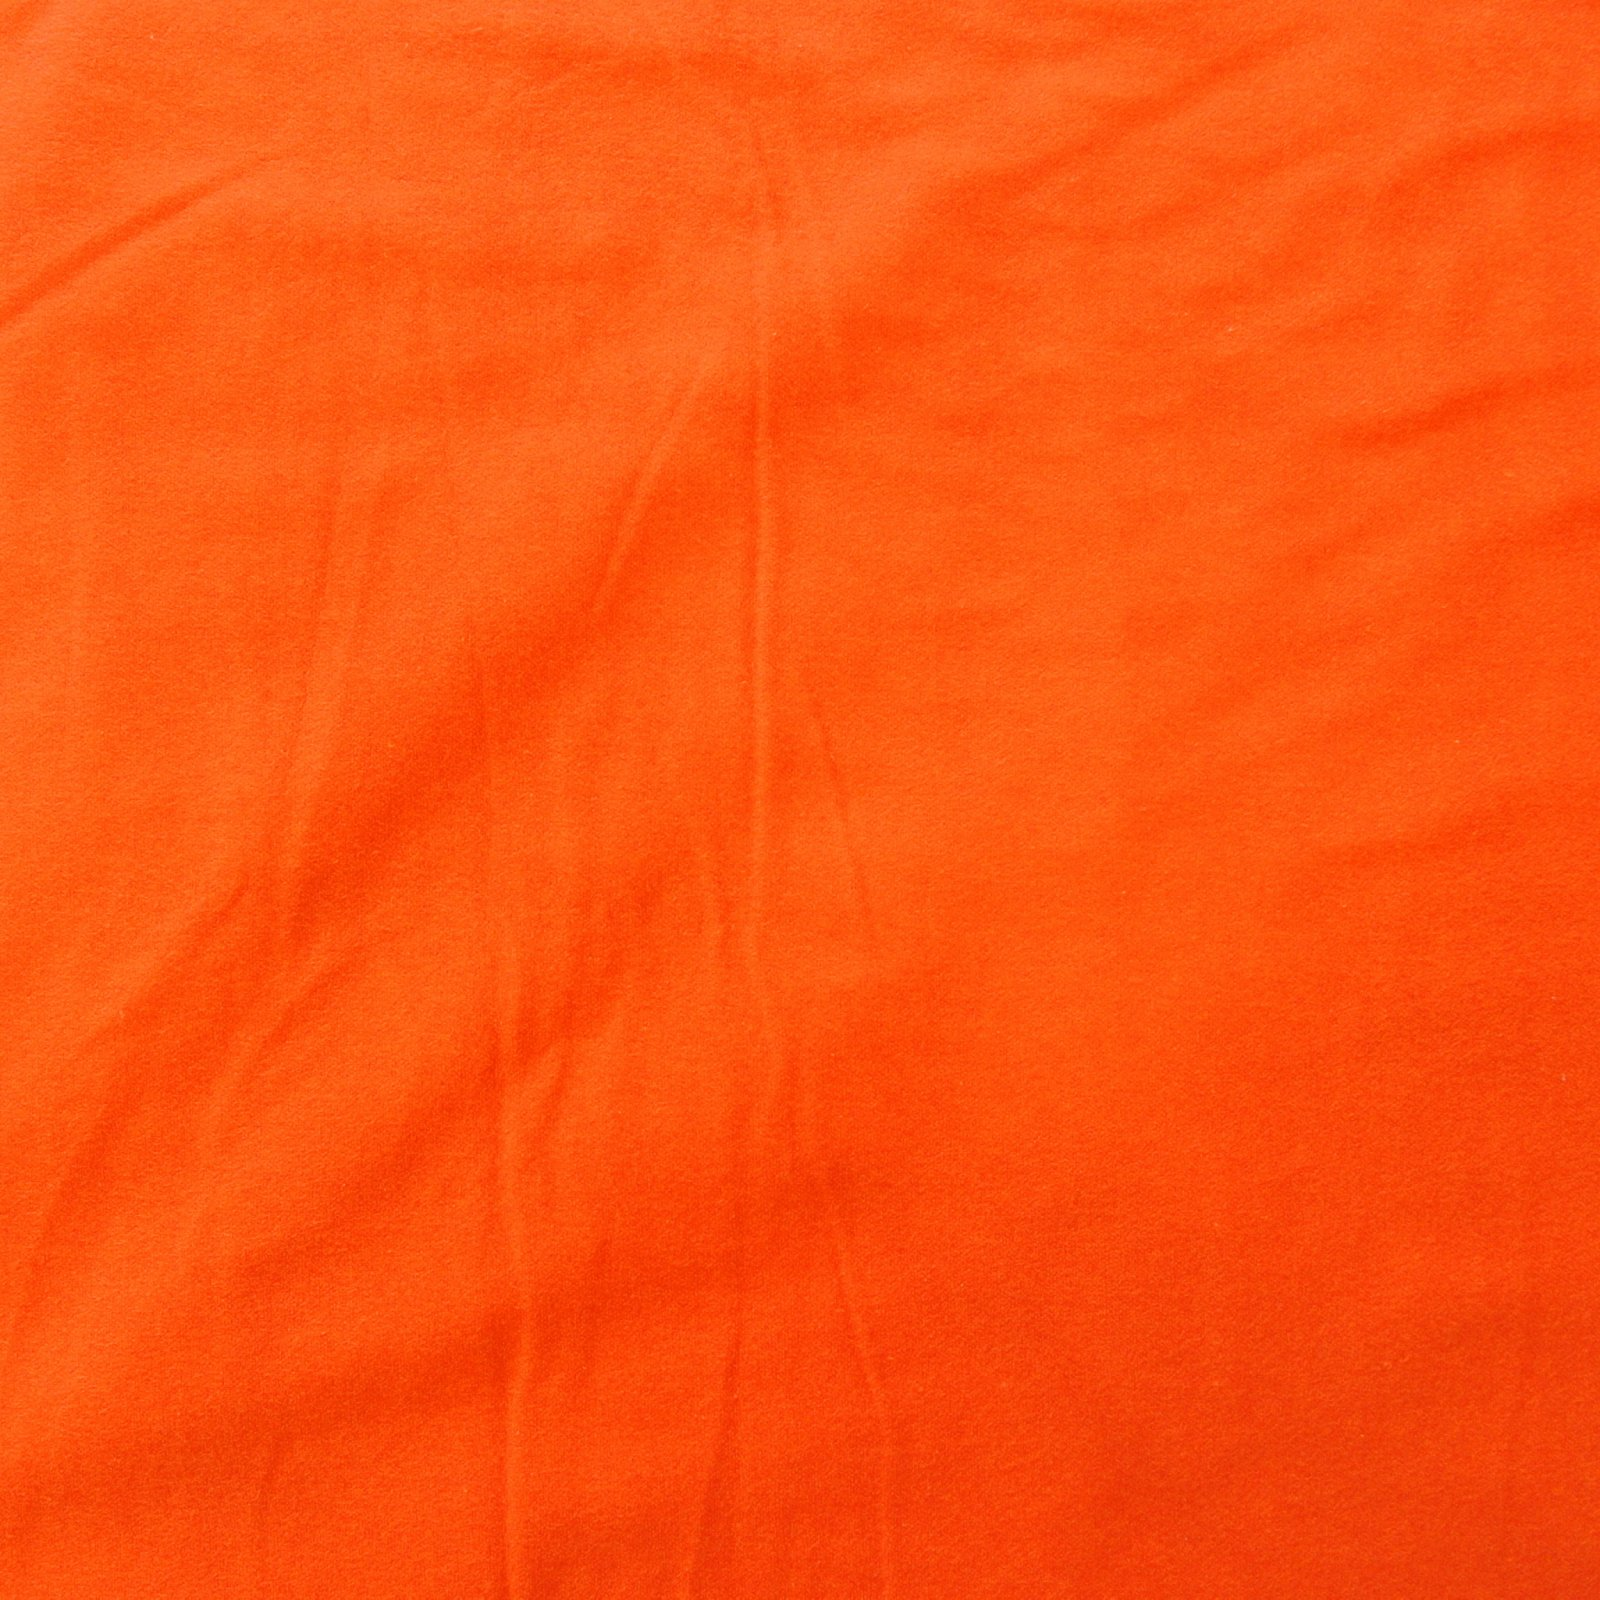 Flannel bright orange